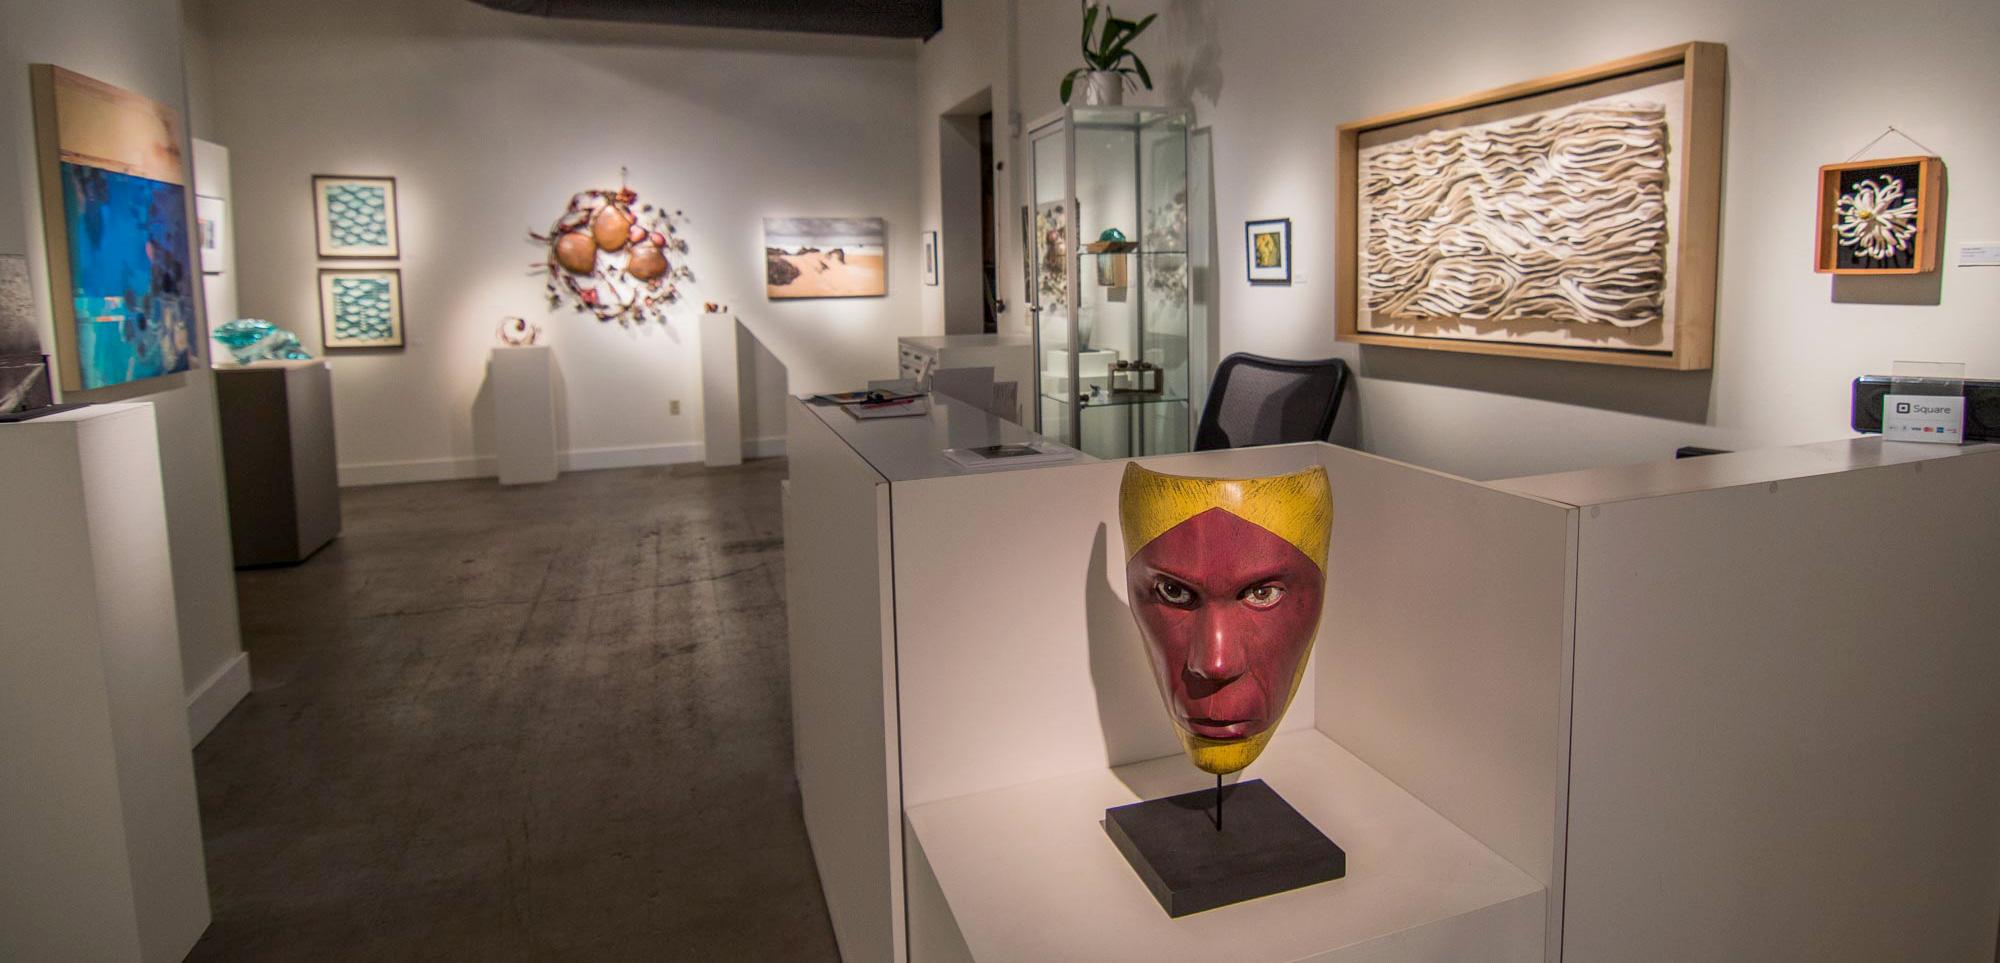 Waterstone Gallery, Portland, OR. December 2016. Photo, Kamala Dolphin-Kingsley